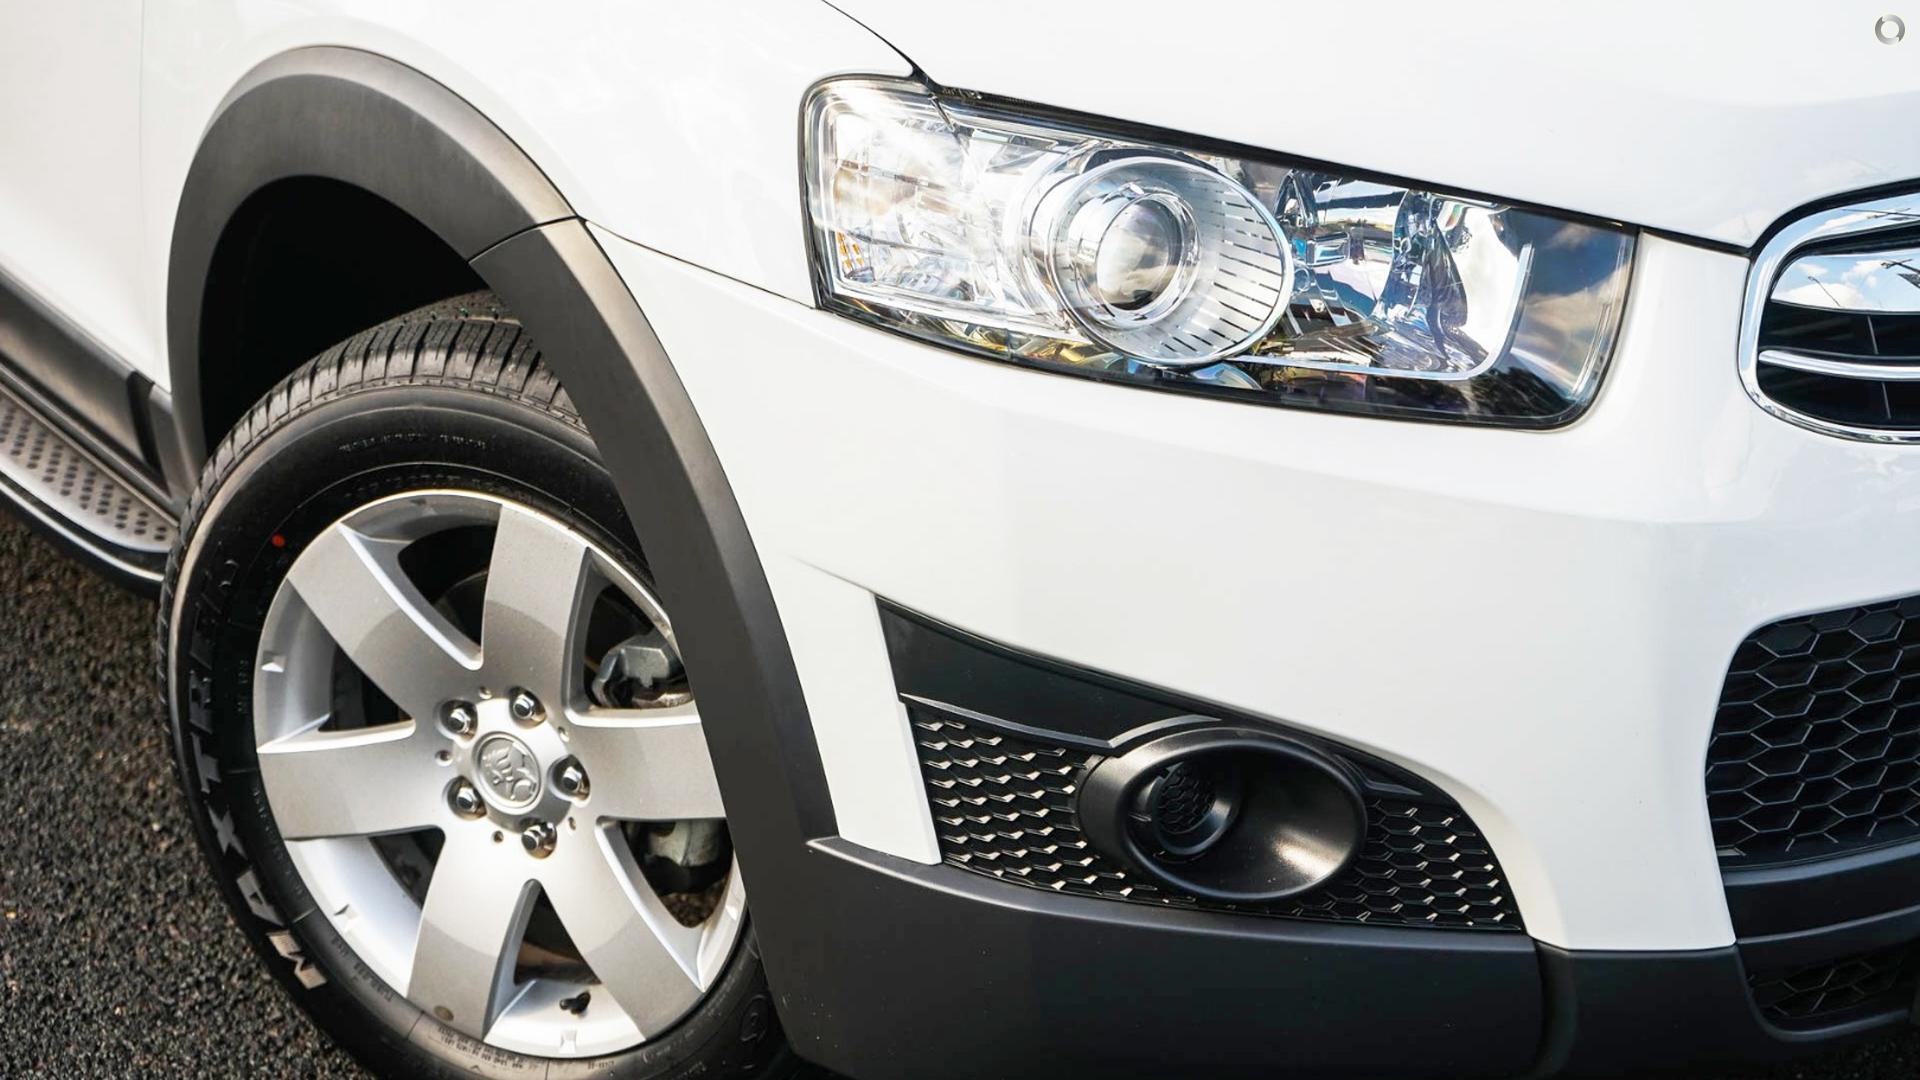 2013 Holden Captiva 7 SX CG